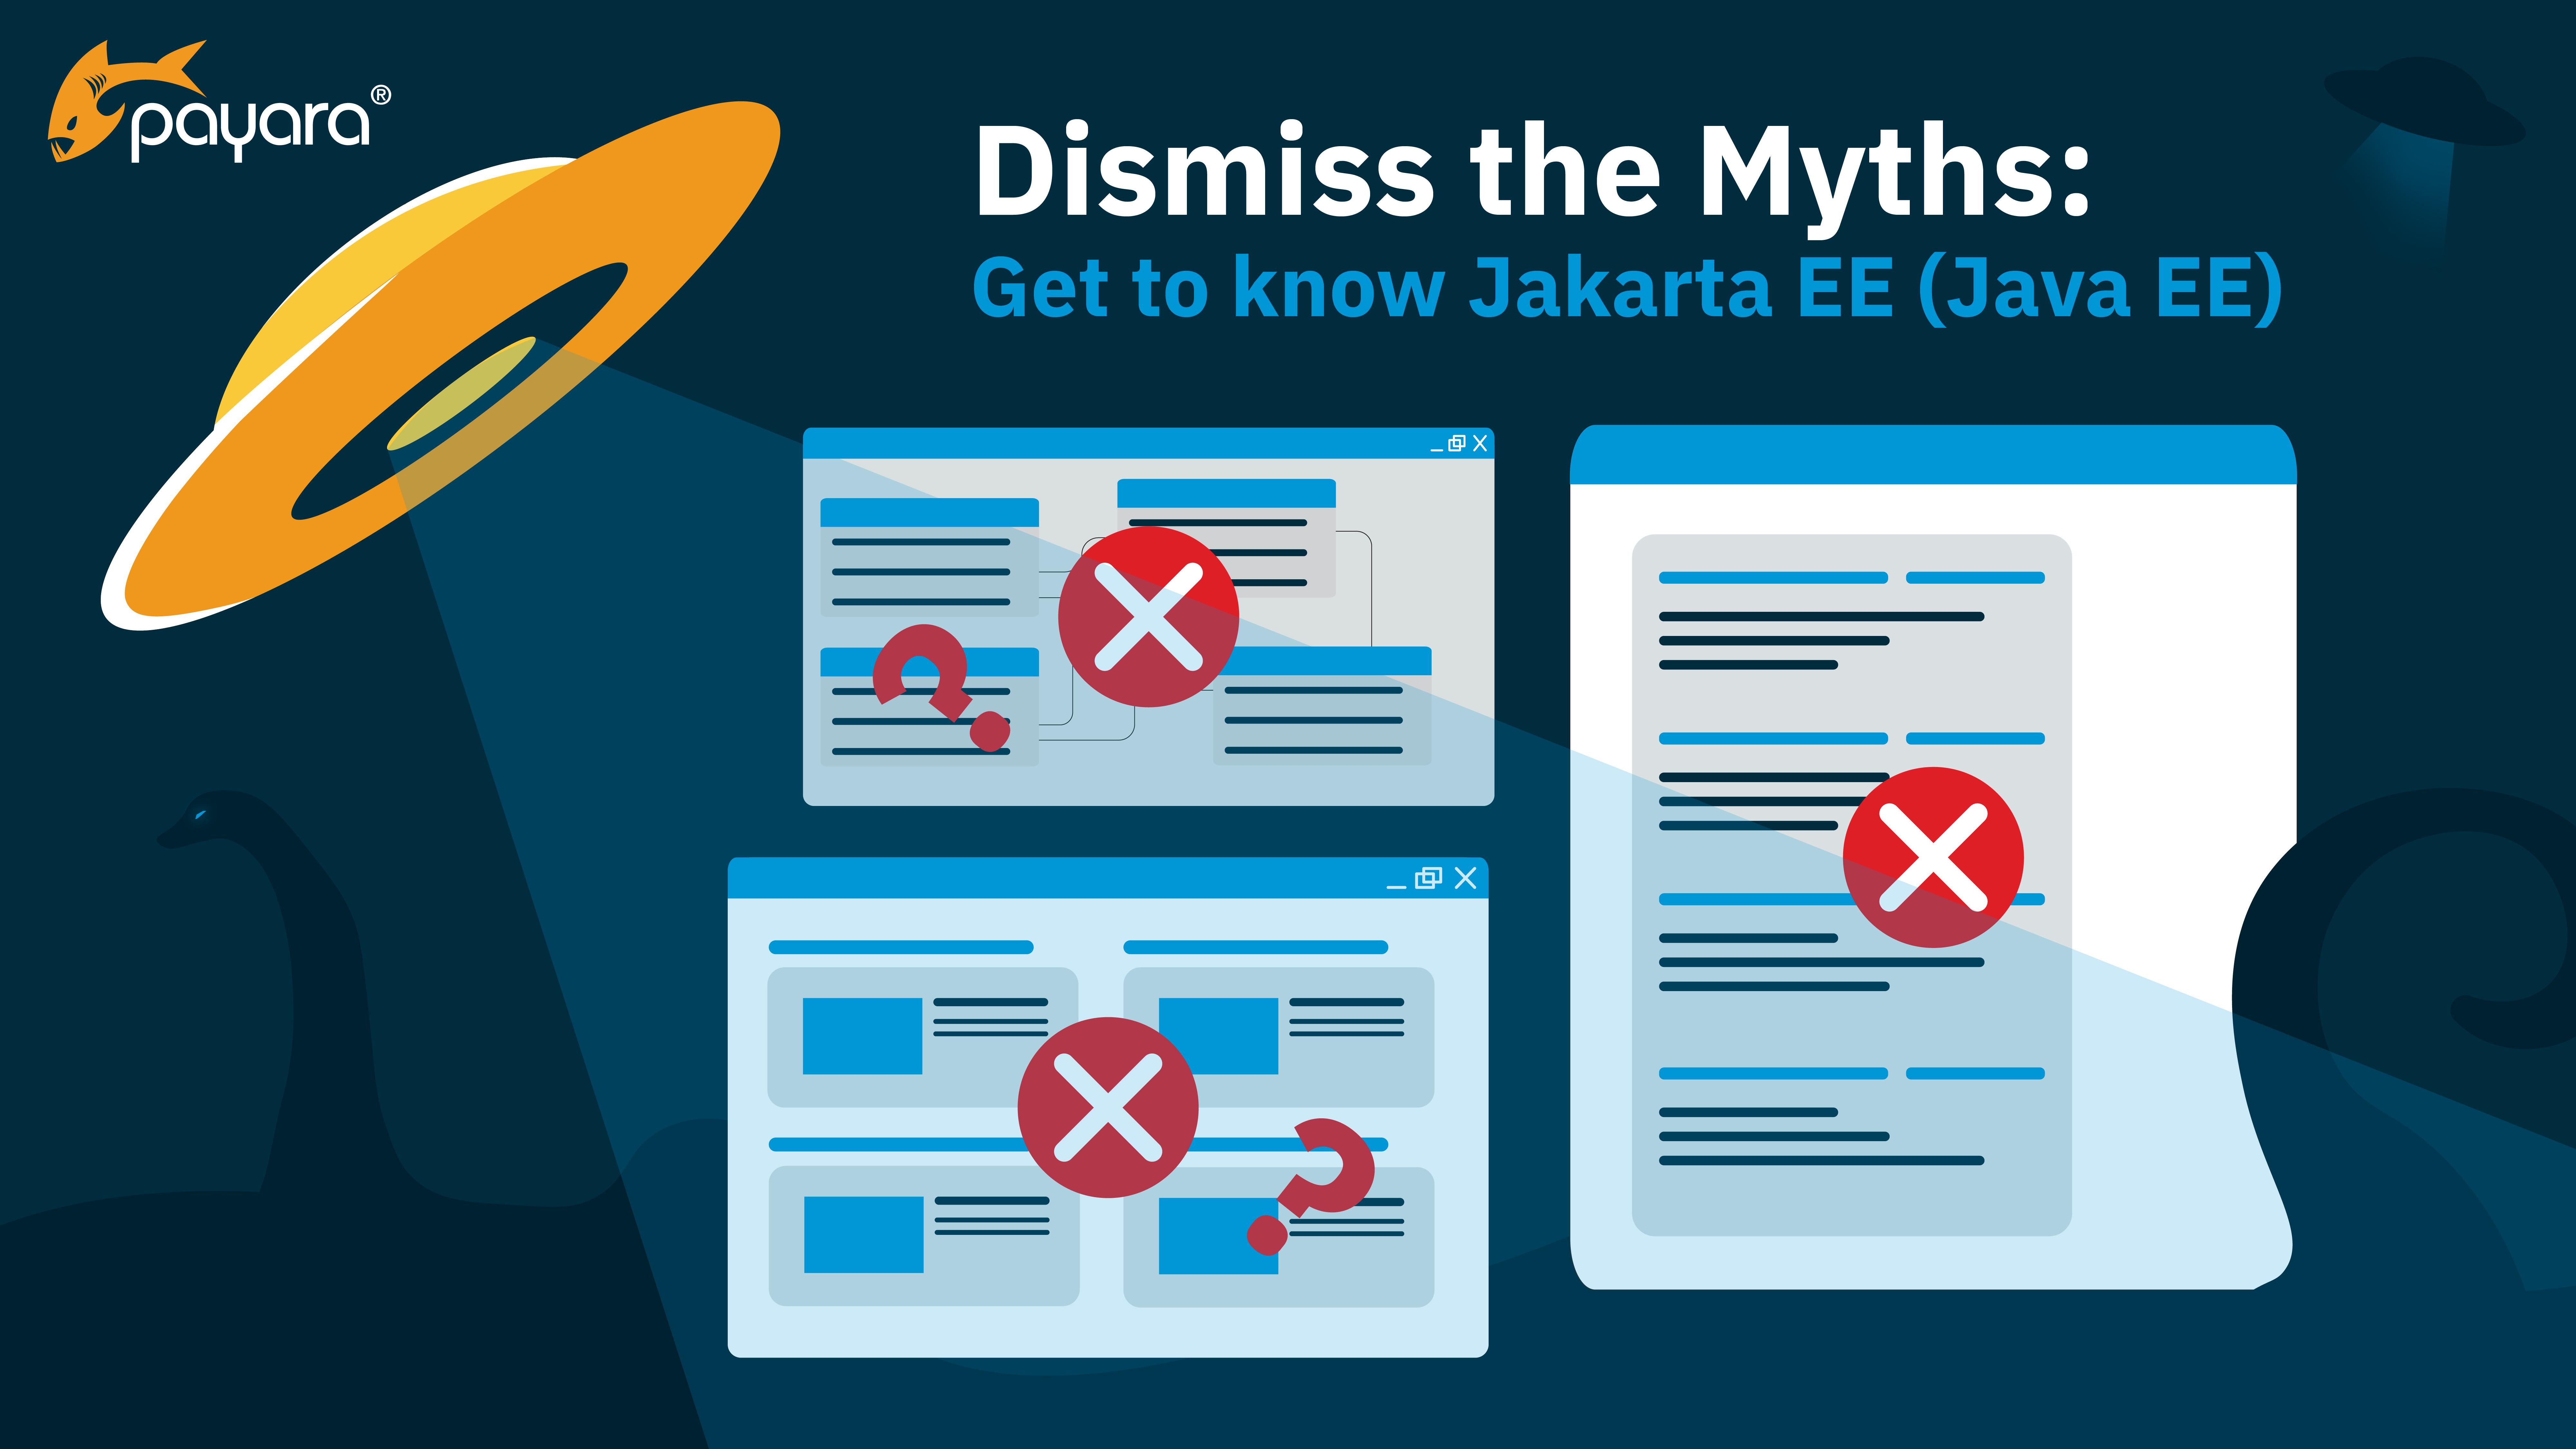 Dissmiss the Myths image